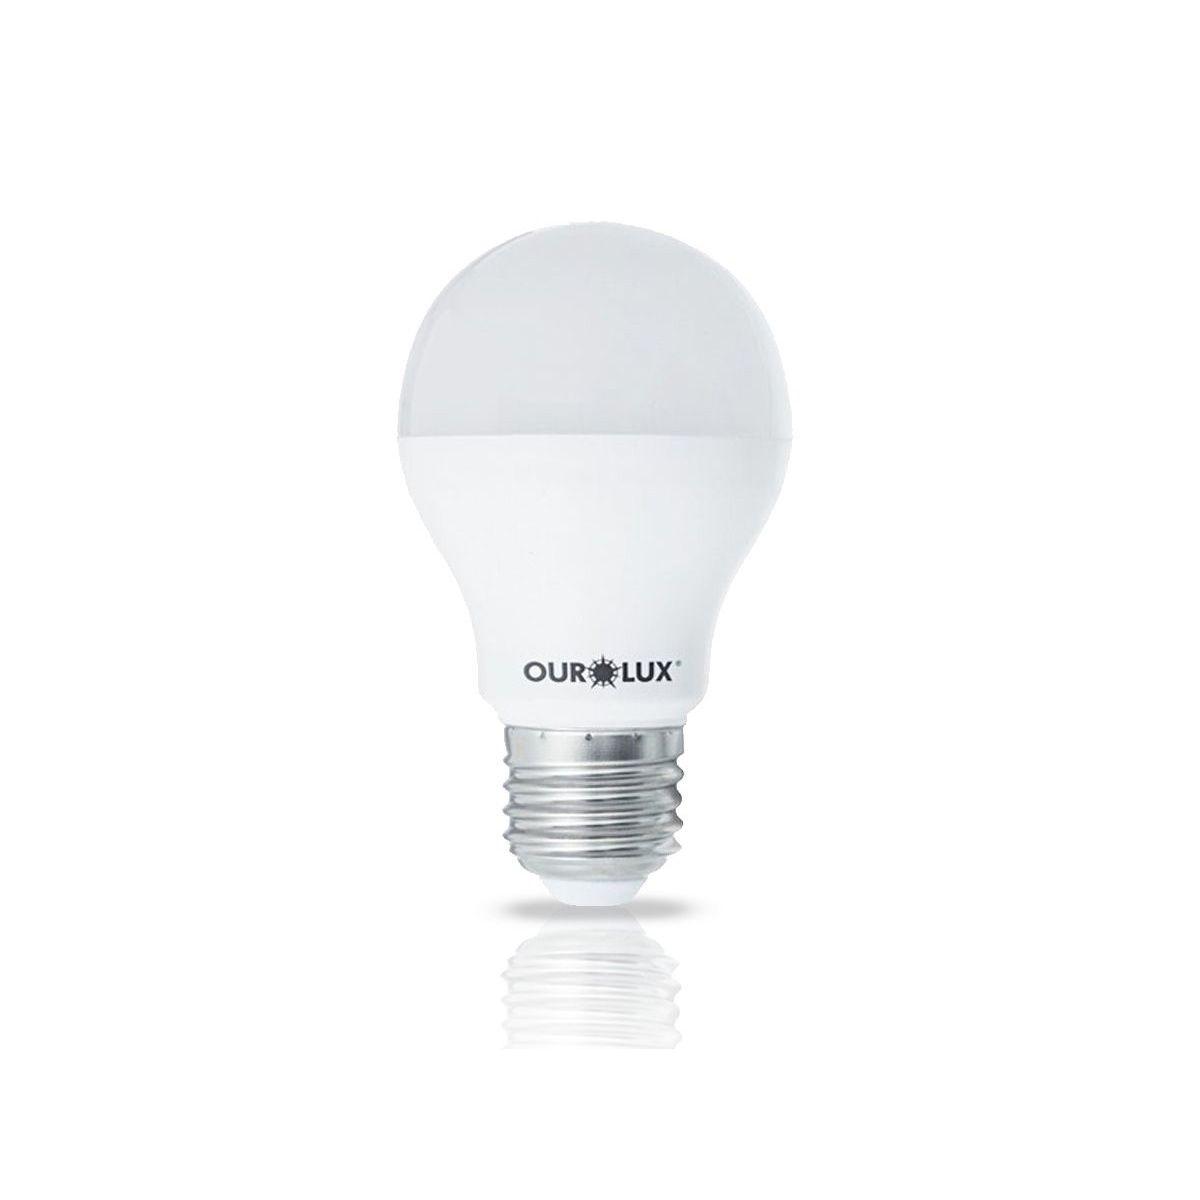 Lâmpada SUPERLED Bulbo A60 9W 6500K -Branco Frio